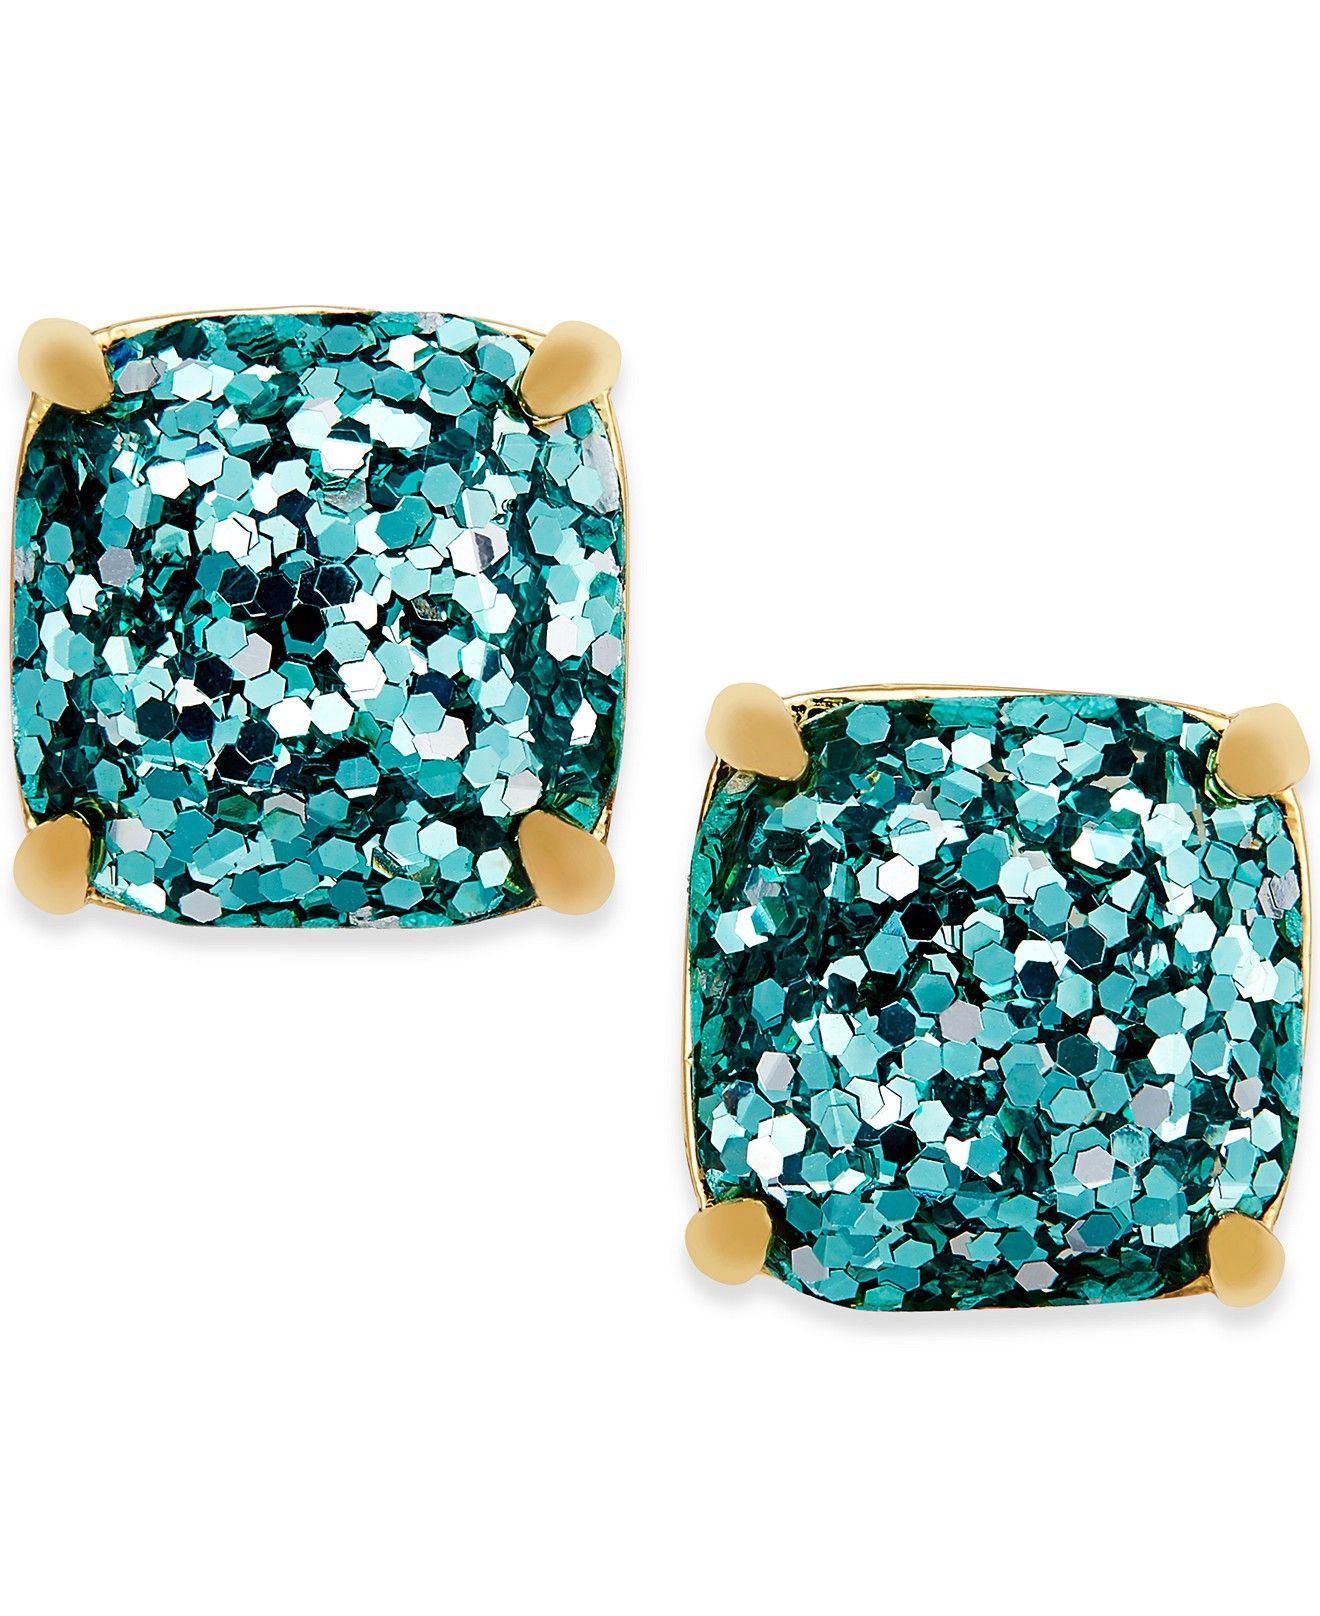 kate spade new york GoldTone Small Square Stud Earrings